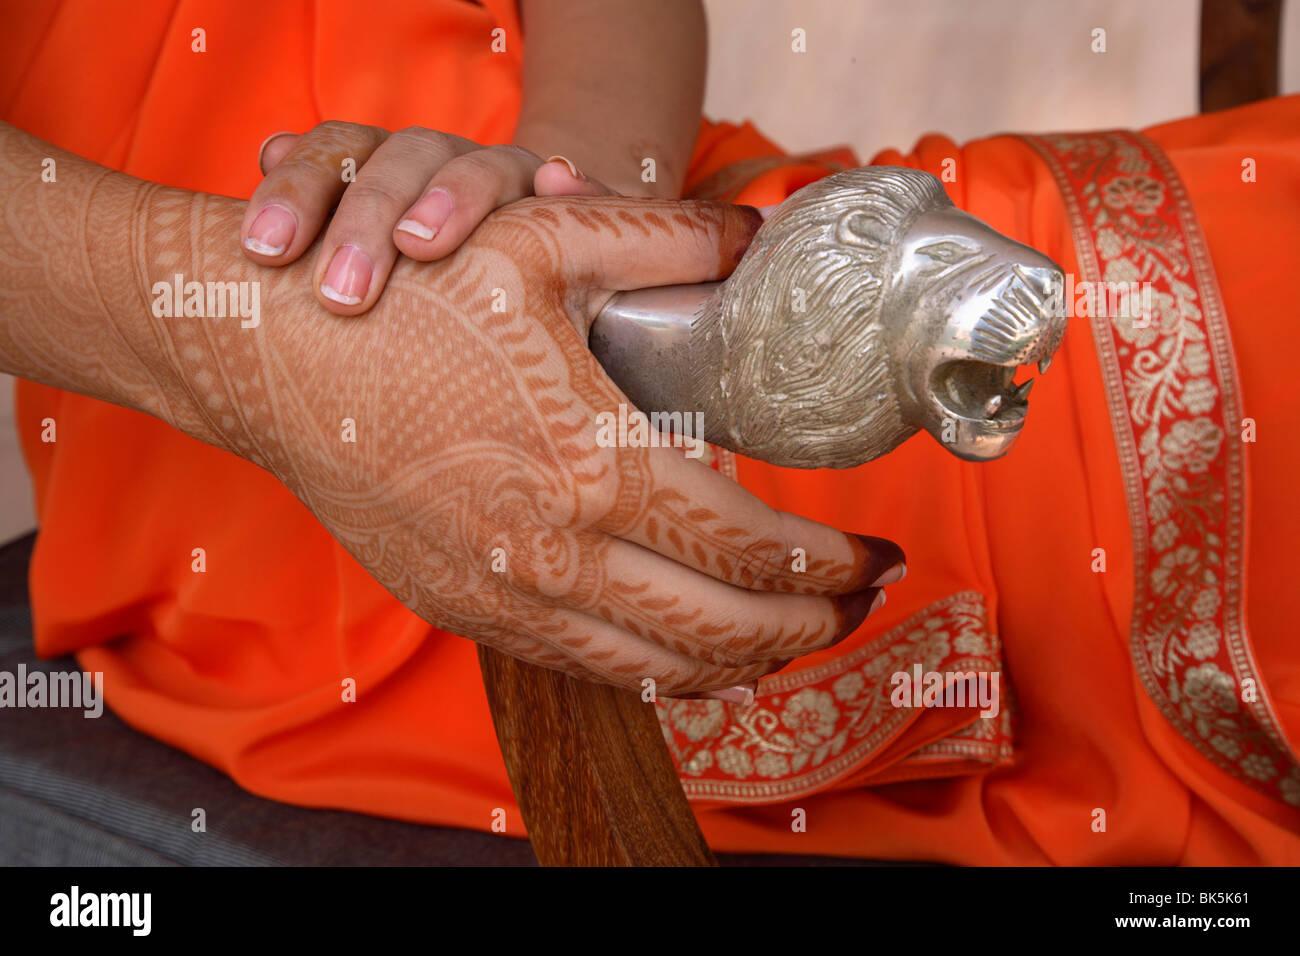 Mehendi Indian Henna Body Art India Asia Stock Photo 29013657